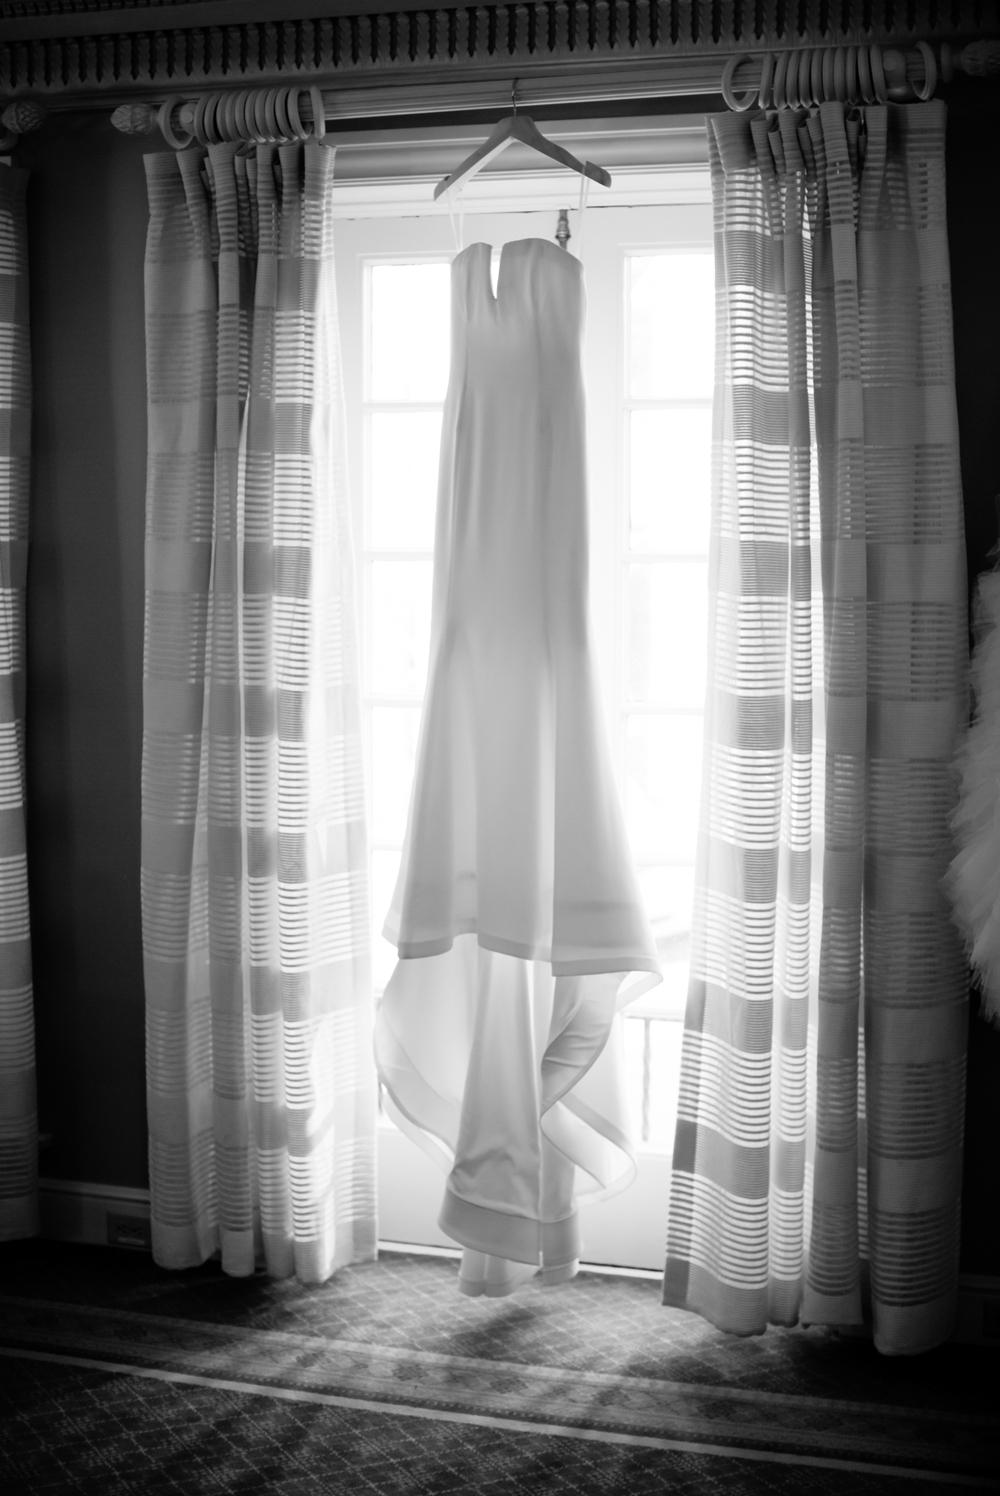 strapless-sheath-dress-hanging-in-window